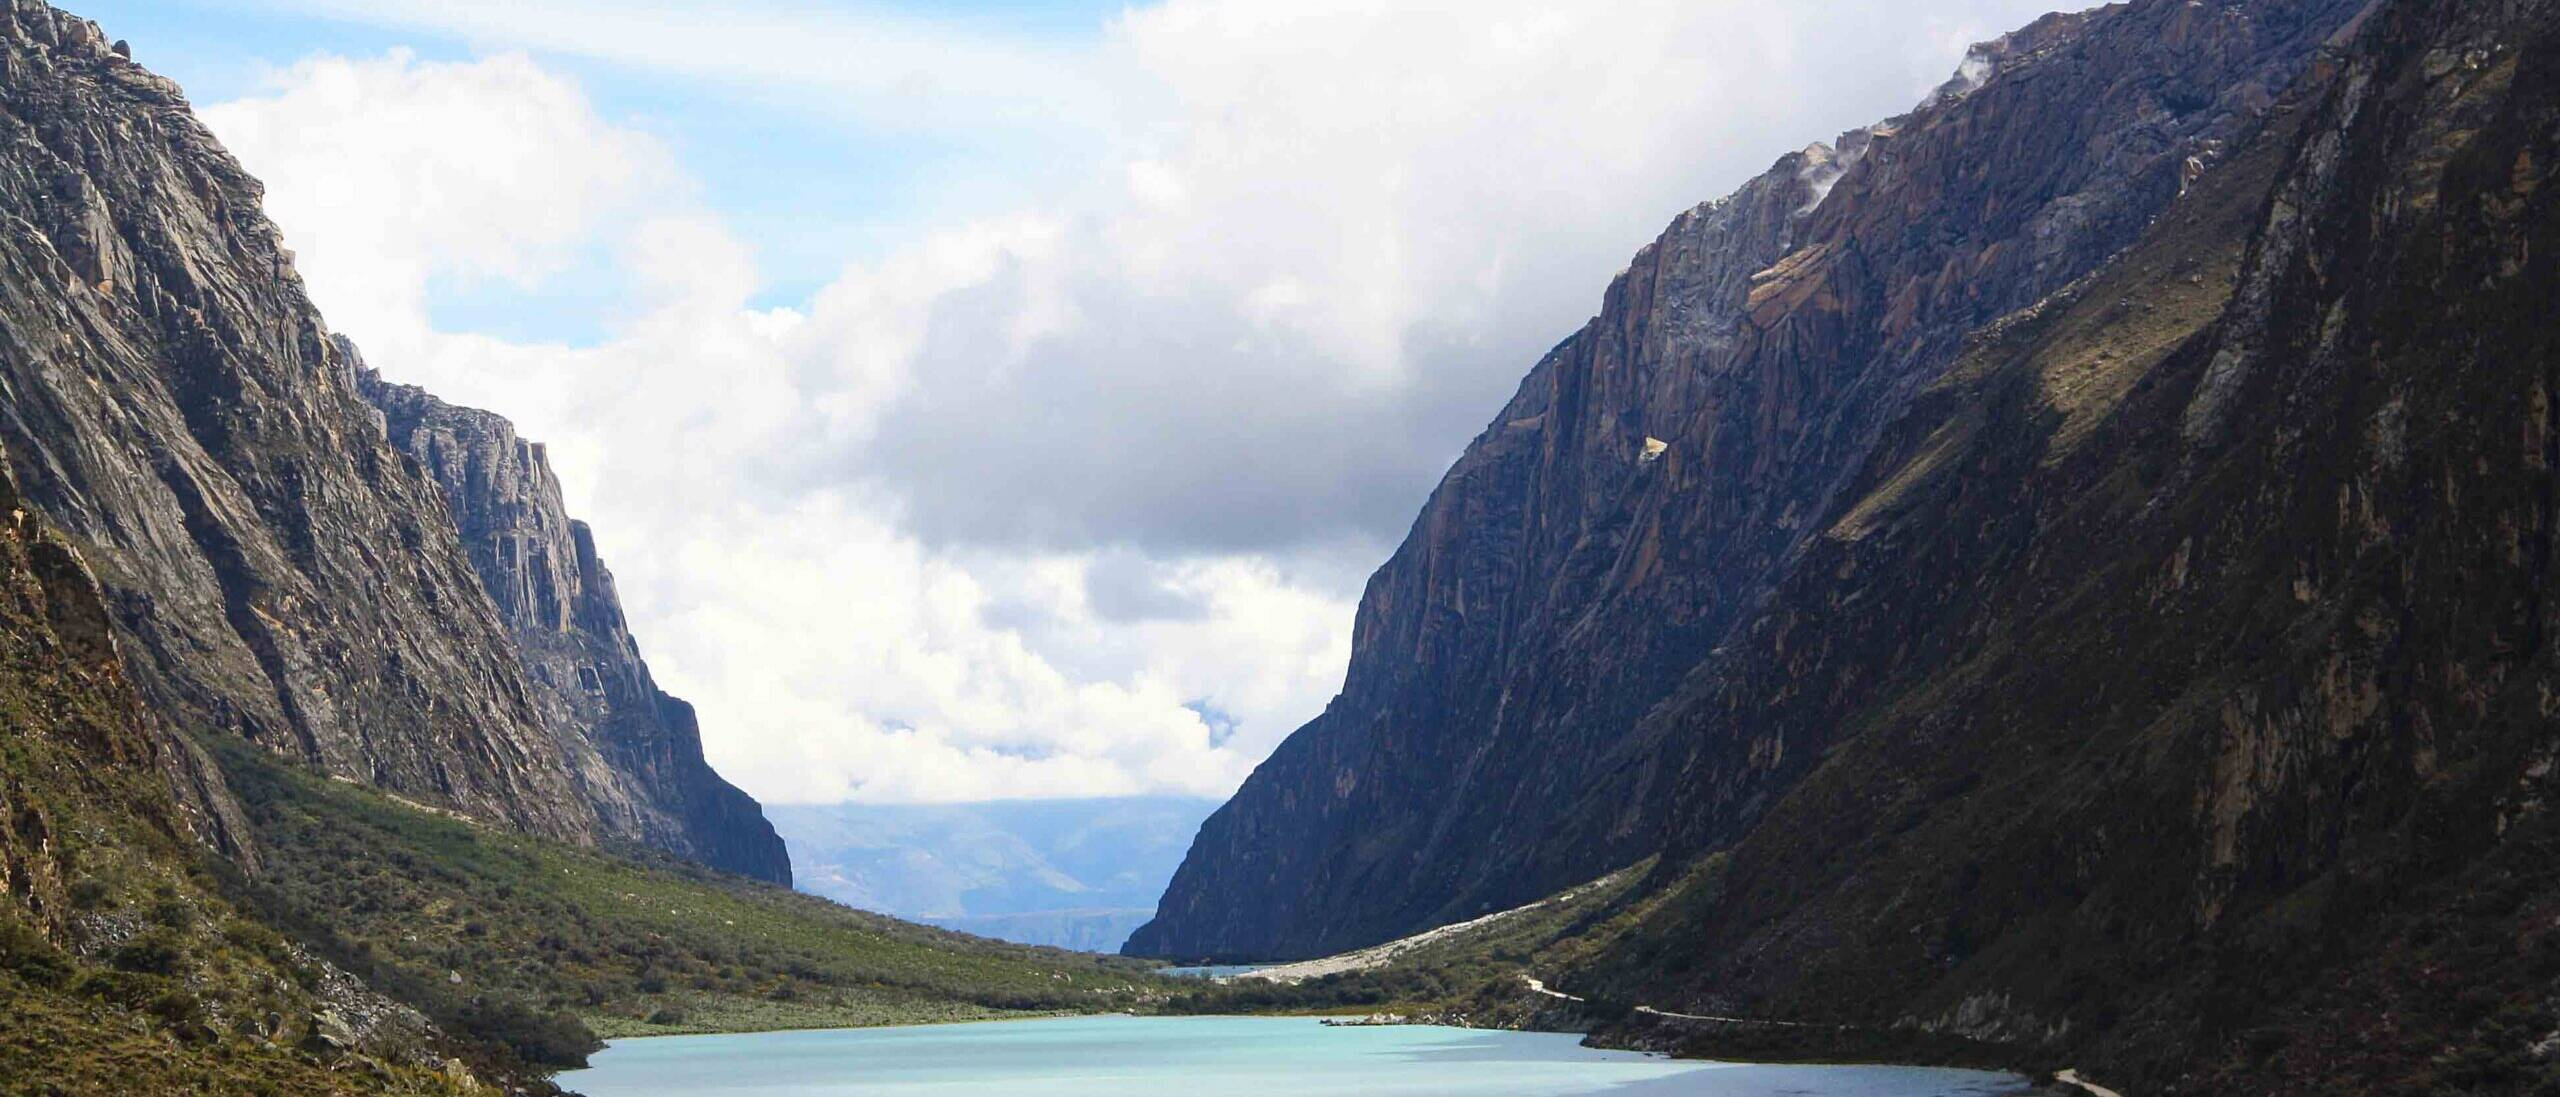 lake and mountains of the cordillera blanca